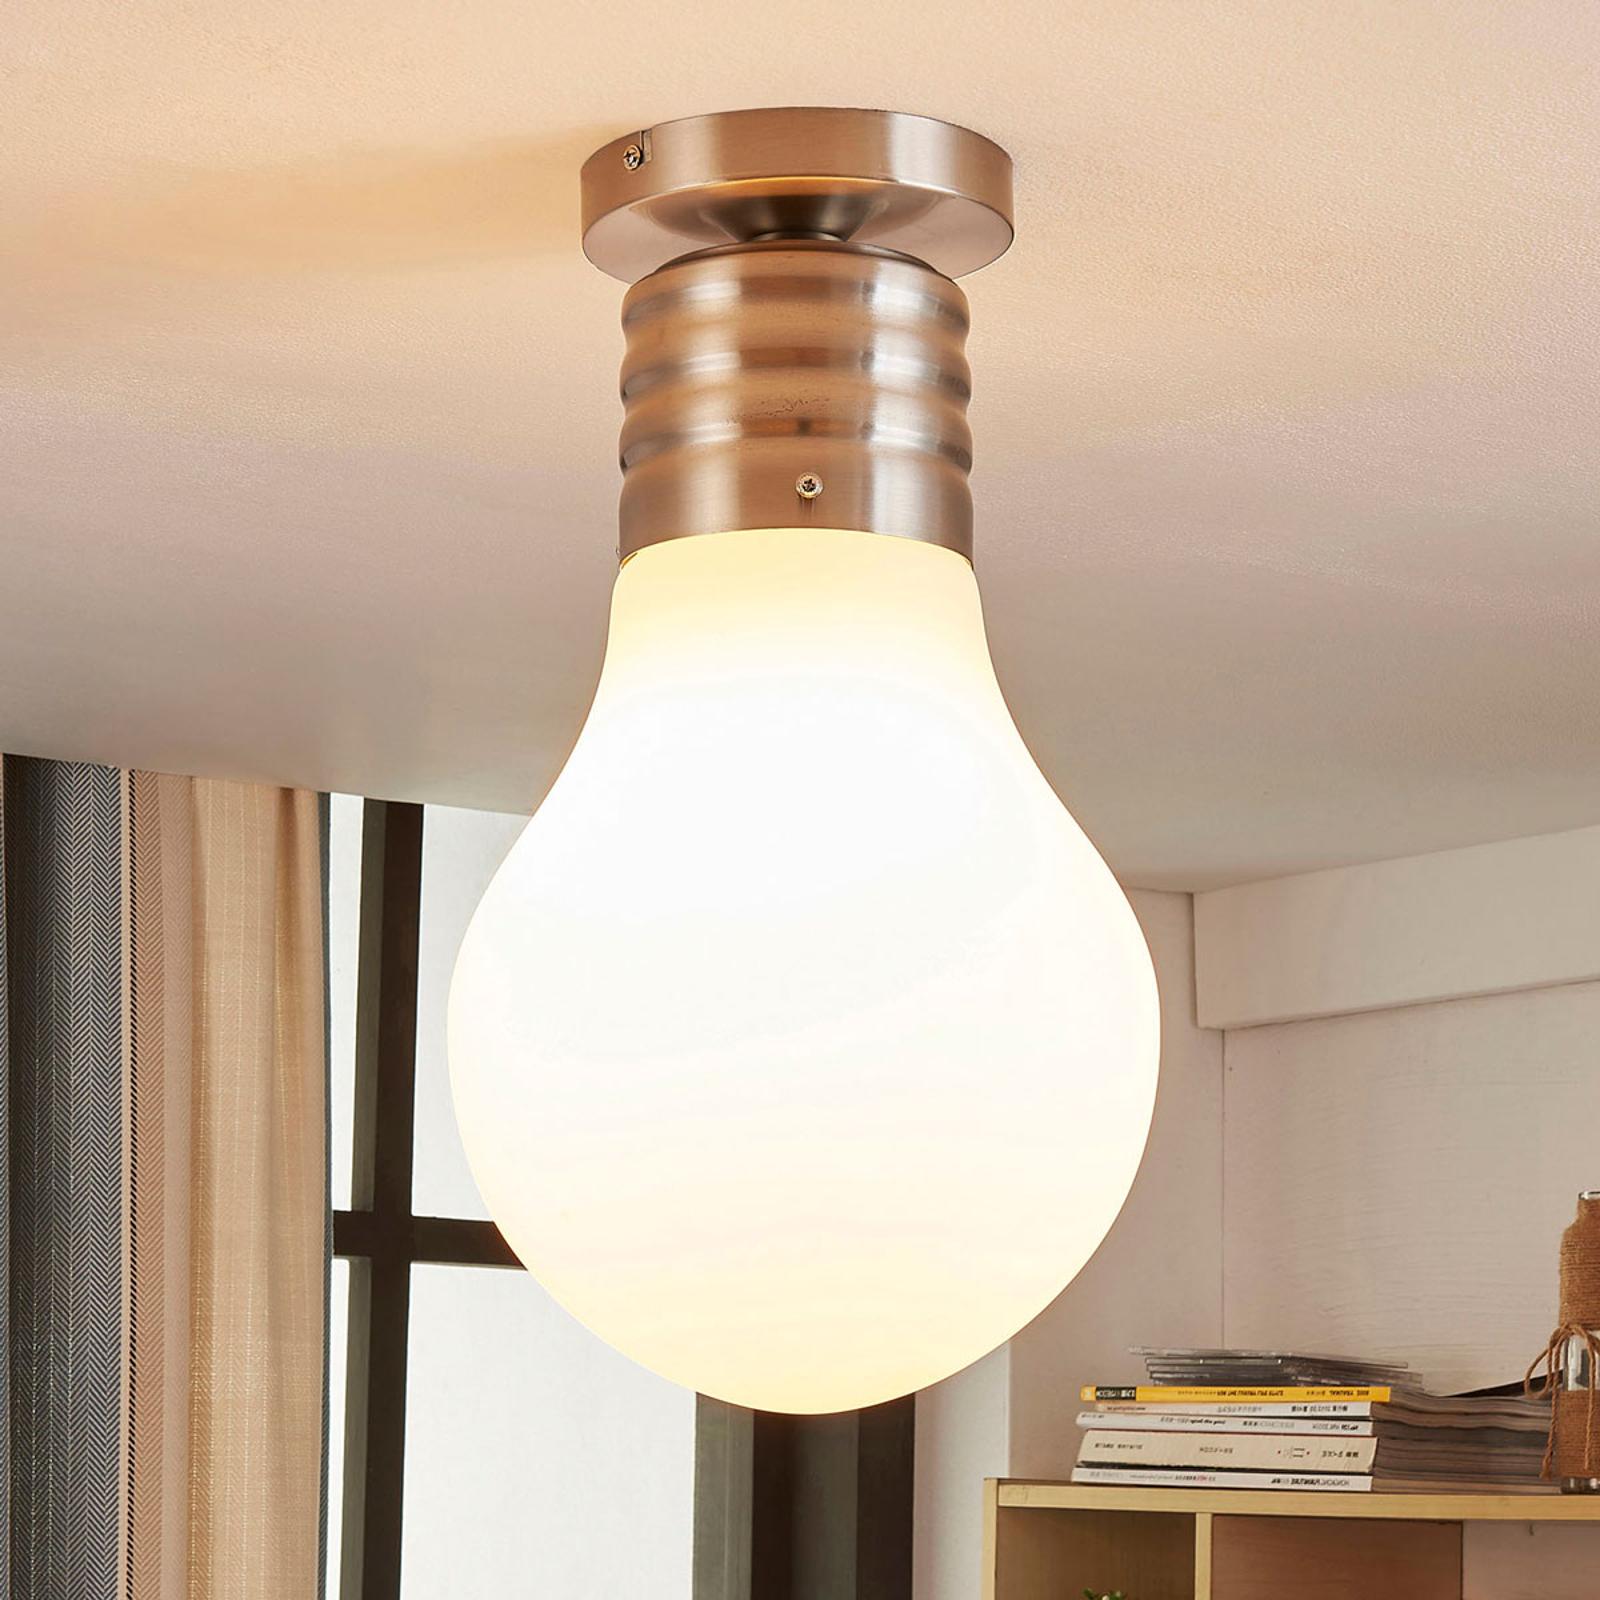 Lampa sufitowa LED Bado, easydim, jak żarówka